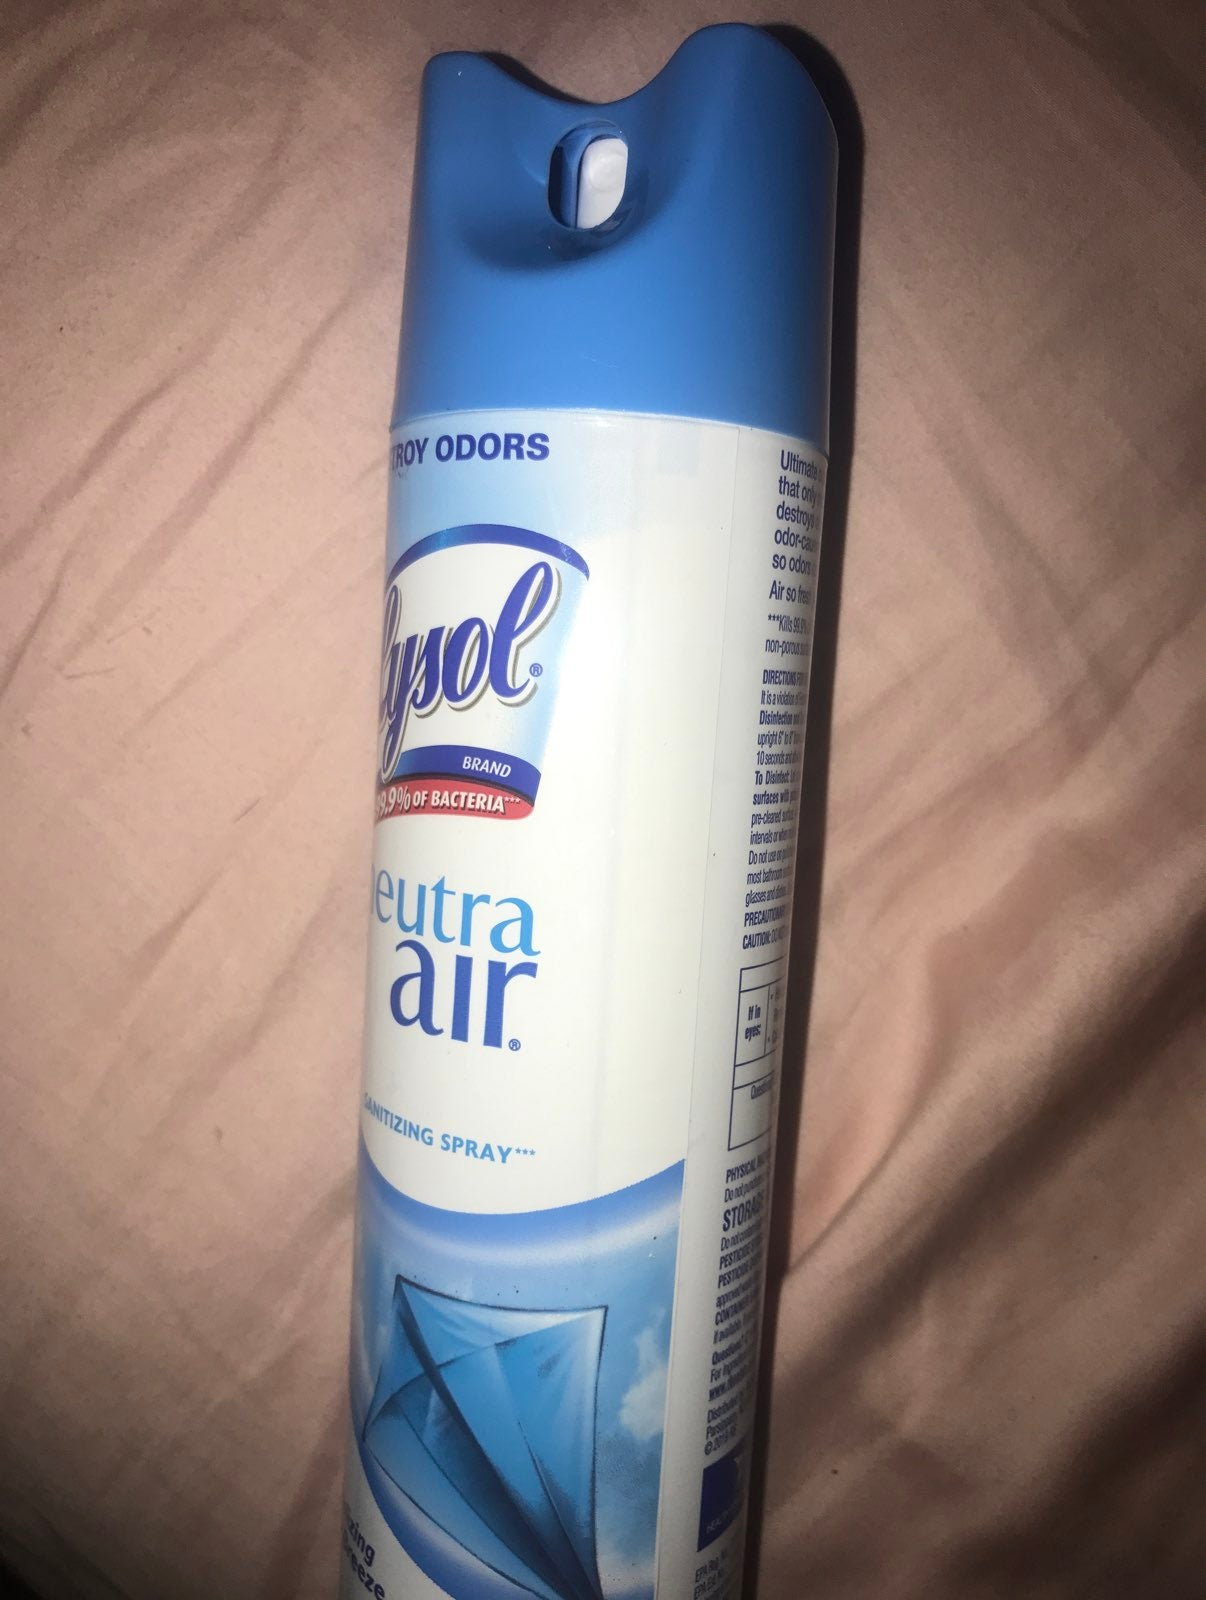 lysol spray